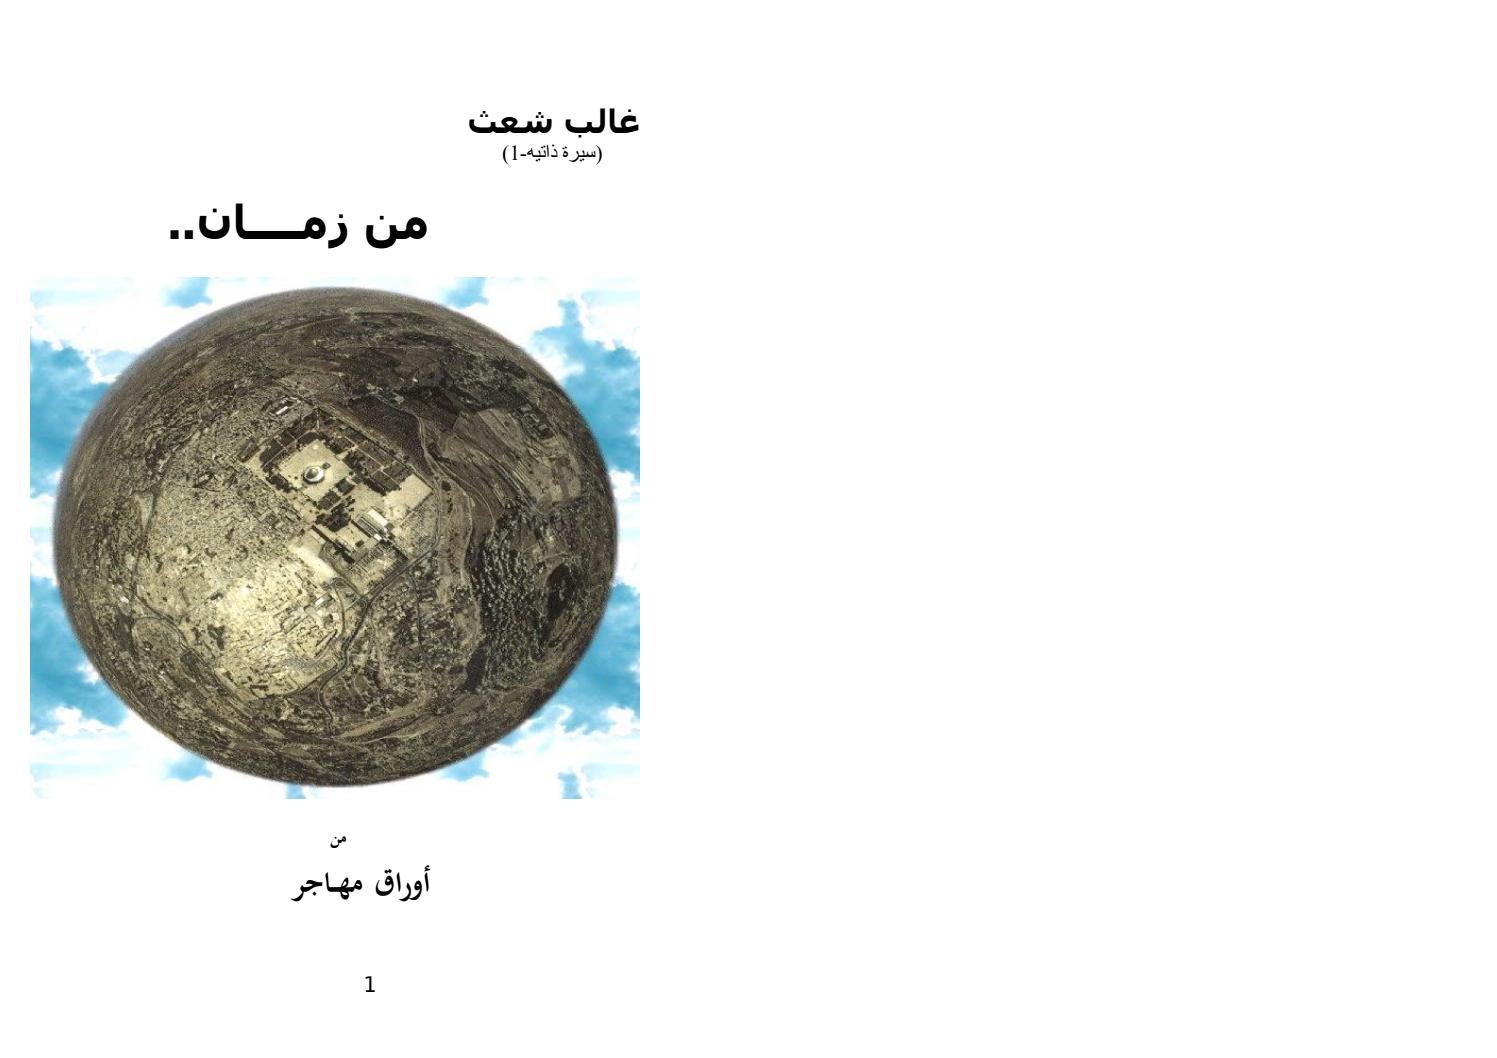 ef6d0b5b3a38a (1) من زمان by Ghaleb Shaath - issuu